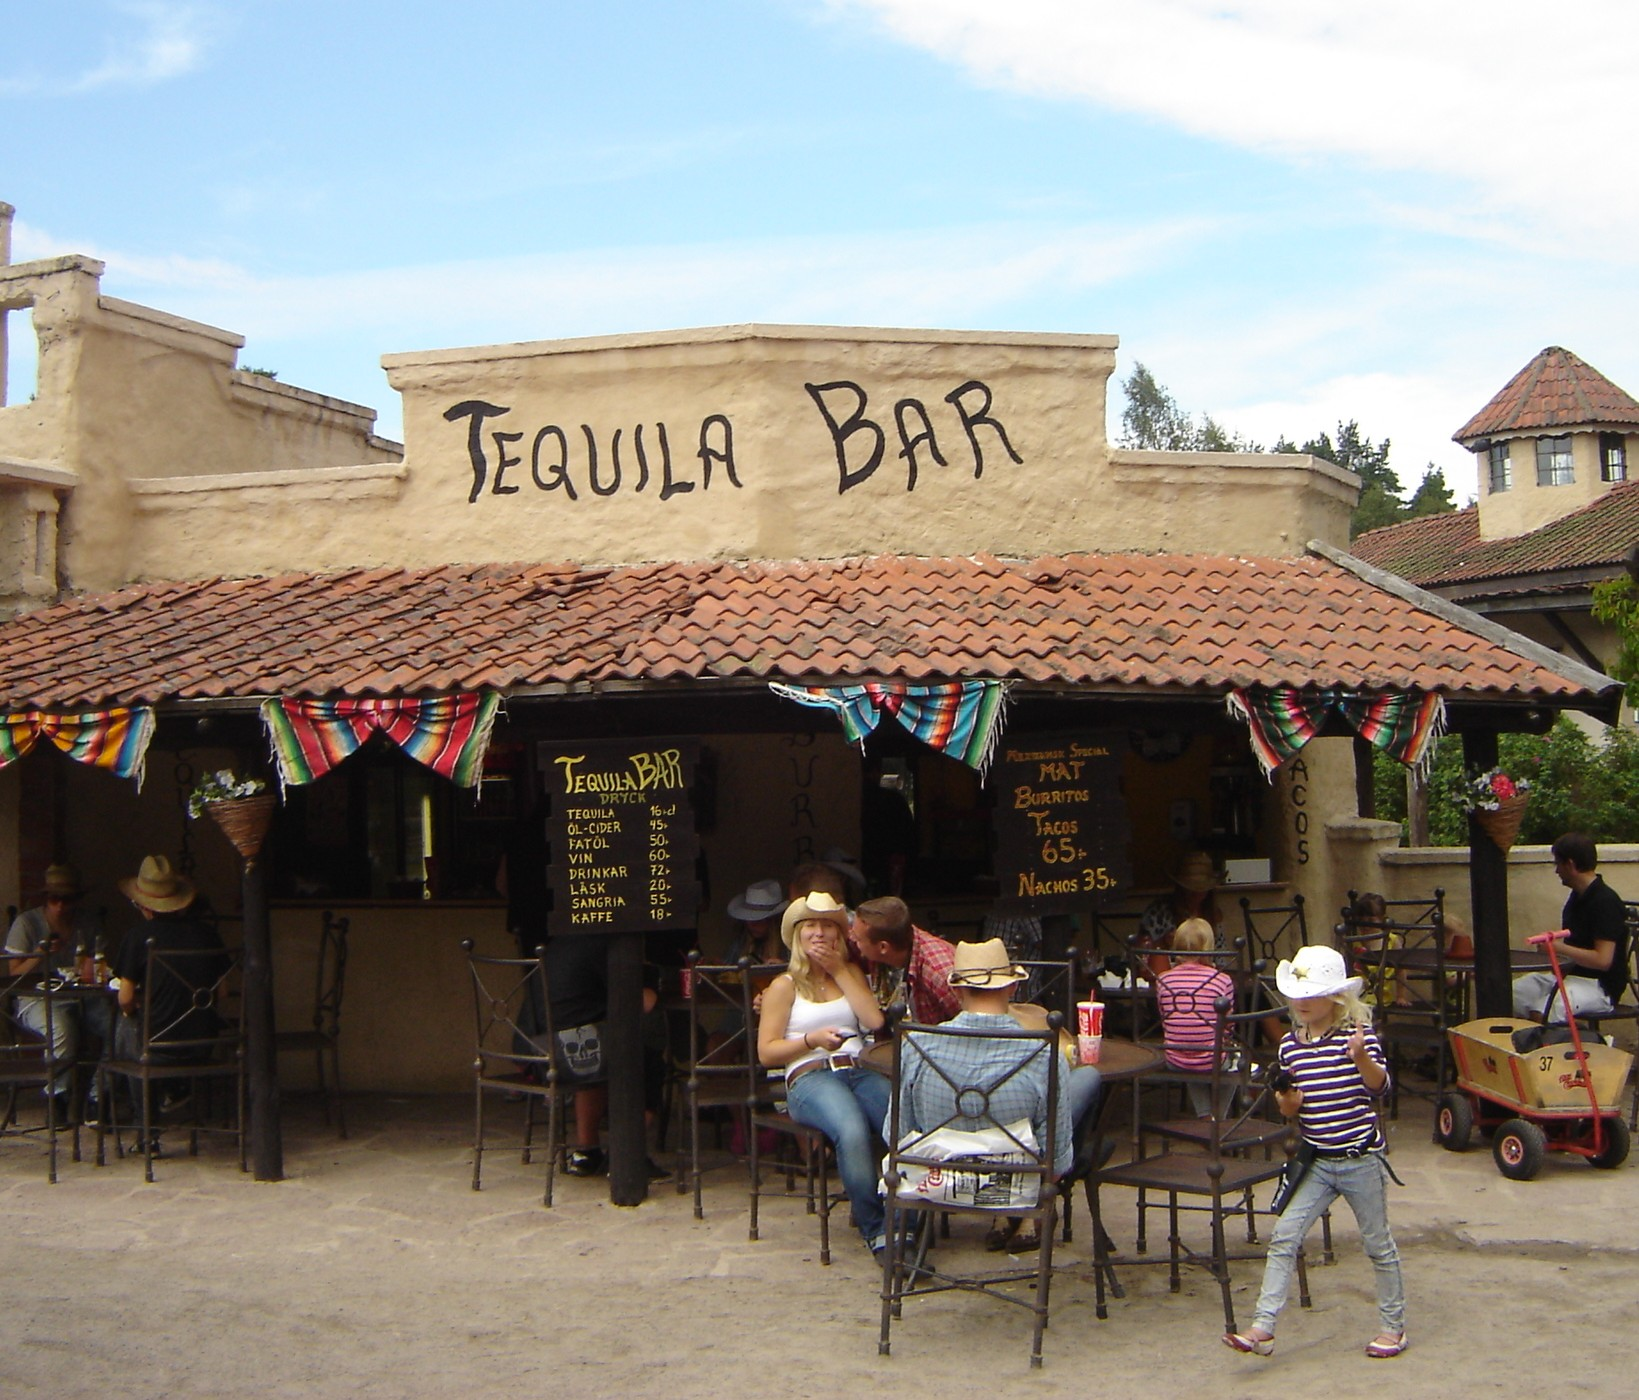 tequila bar high chaparral big bengt mexico